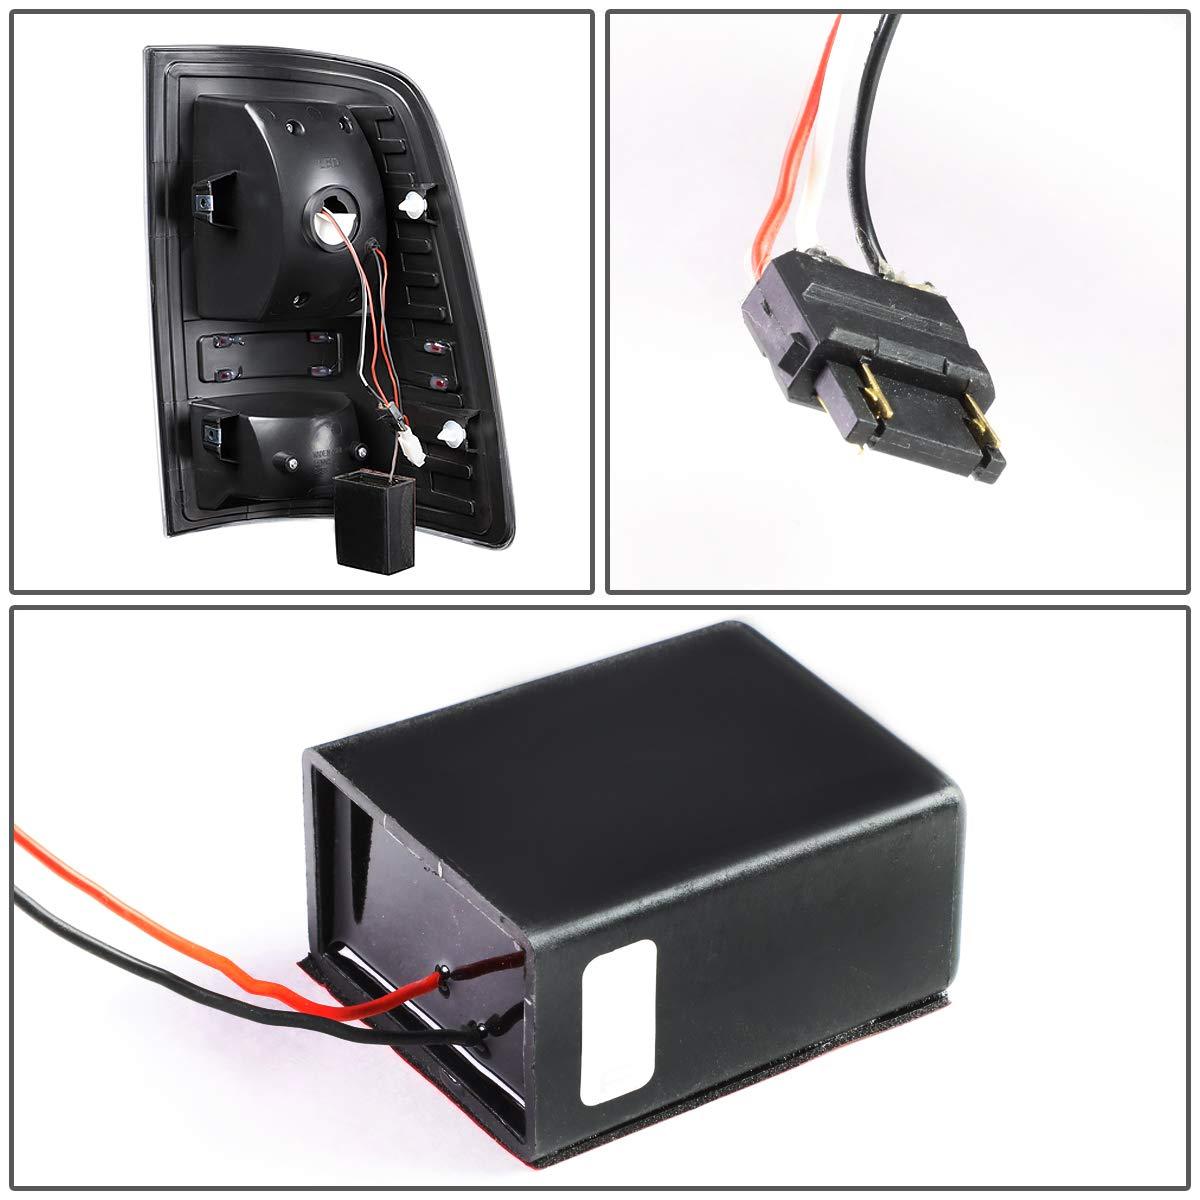 DNA Motoring TL-DRAM09-LED-3D-BK-SM-G2 Pair Black Housing Smoked Lens 3D LED Tail Lights 09-17 Dodge Ram